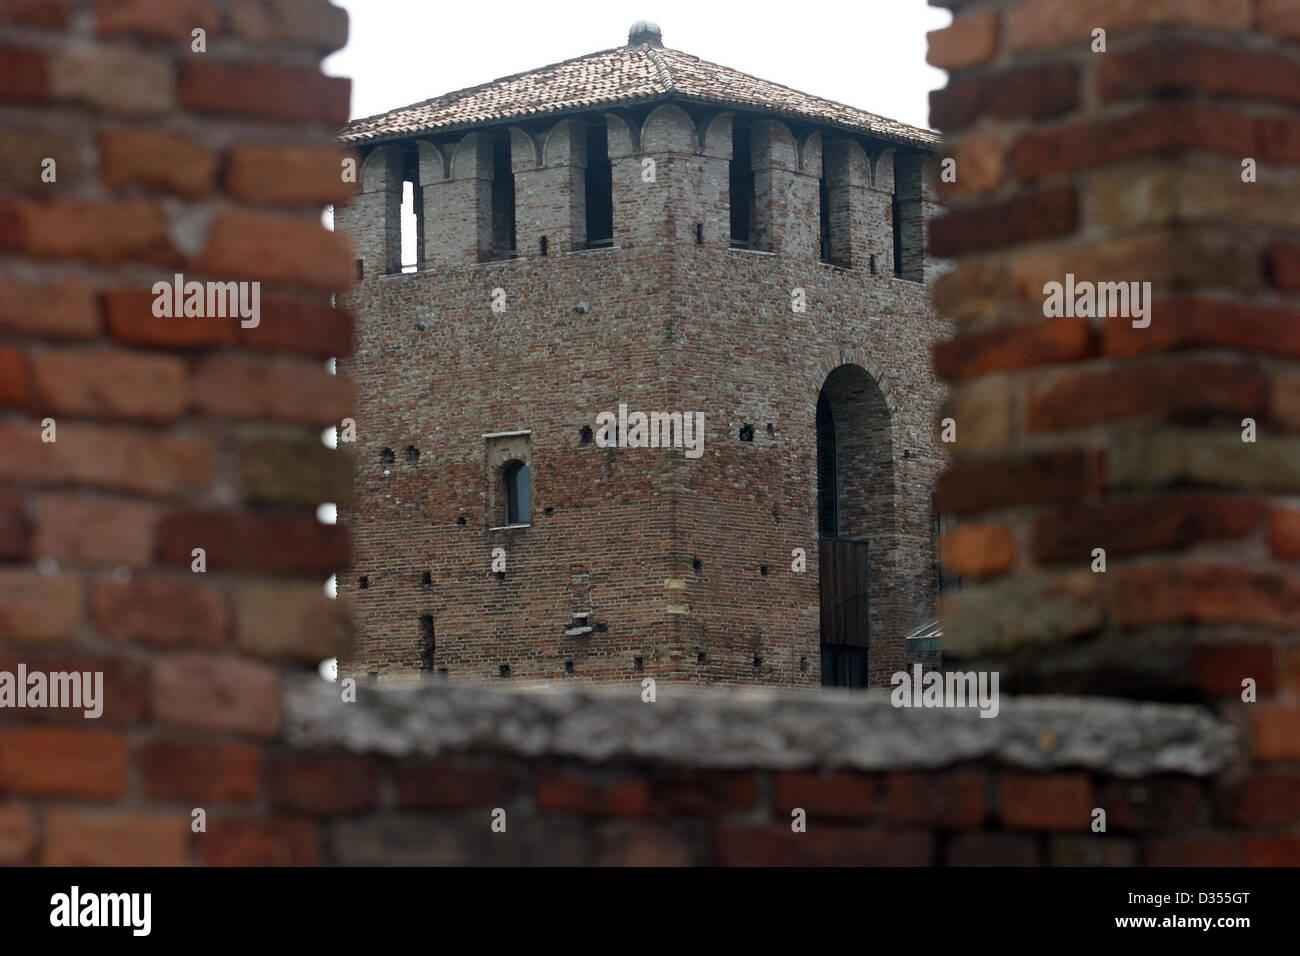 Italy, Verona, Scaliger Bridge (ponte Scaligero) - Stock Image